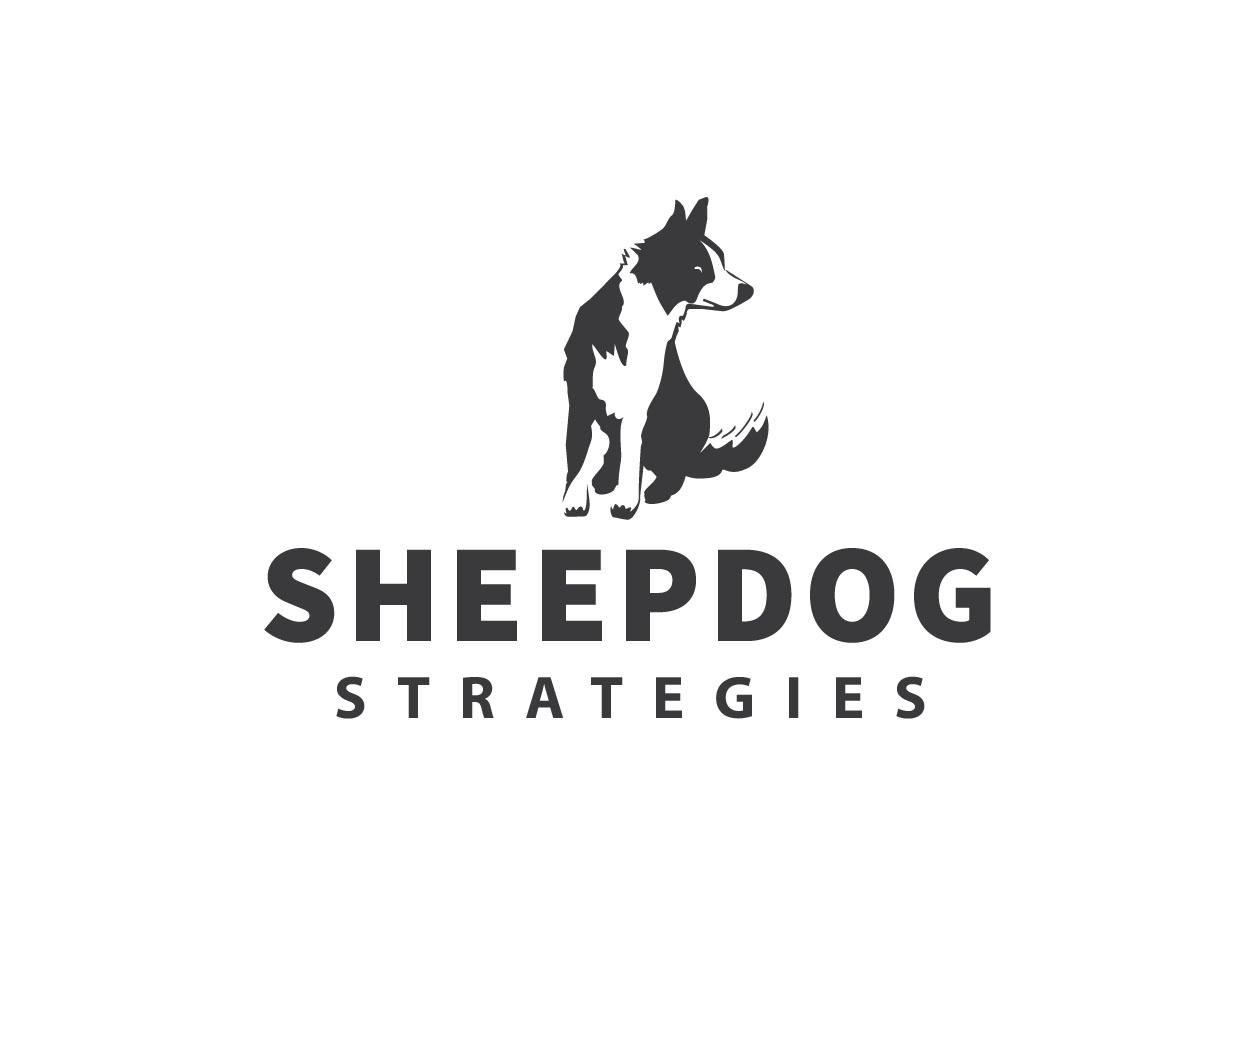 SheepDog_logo.jpg